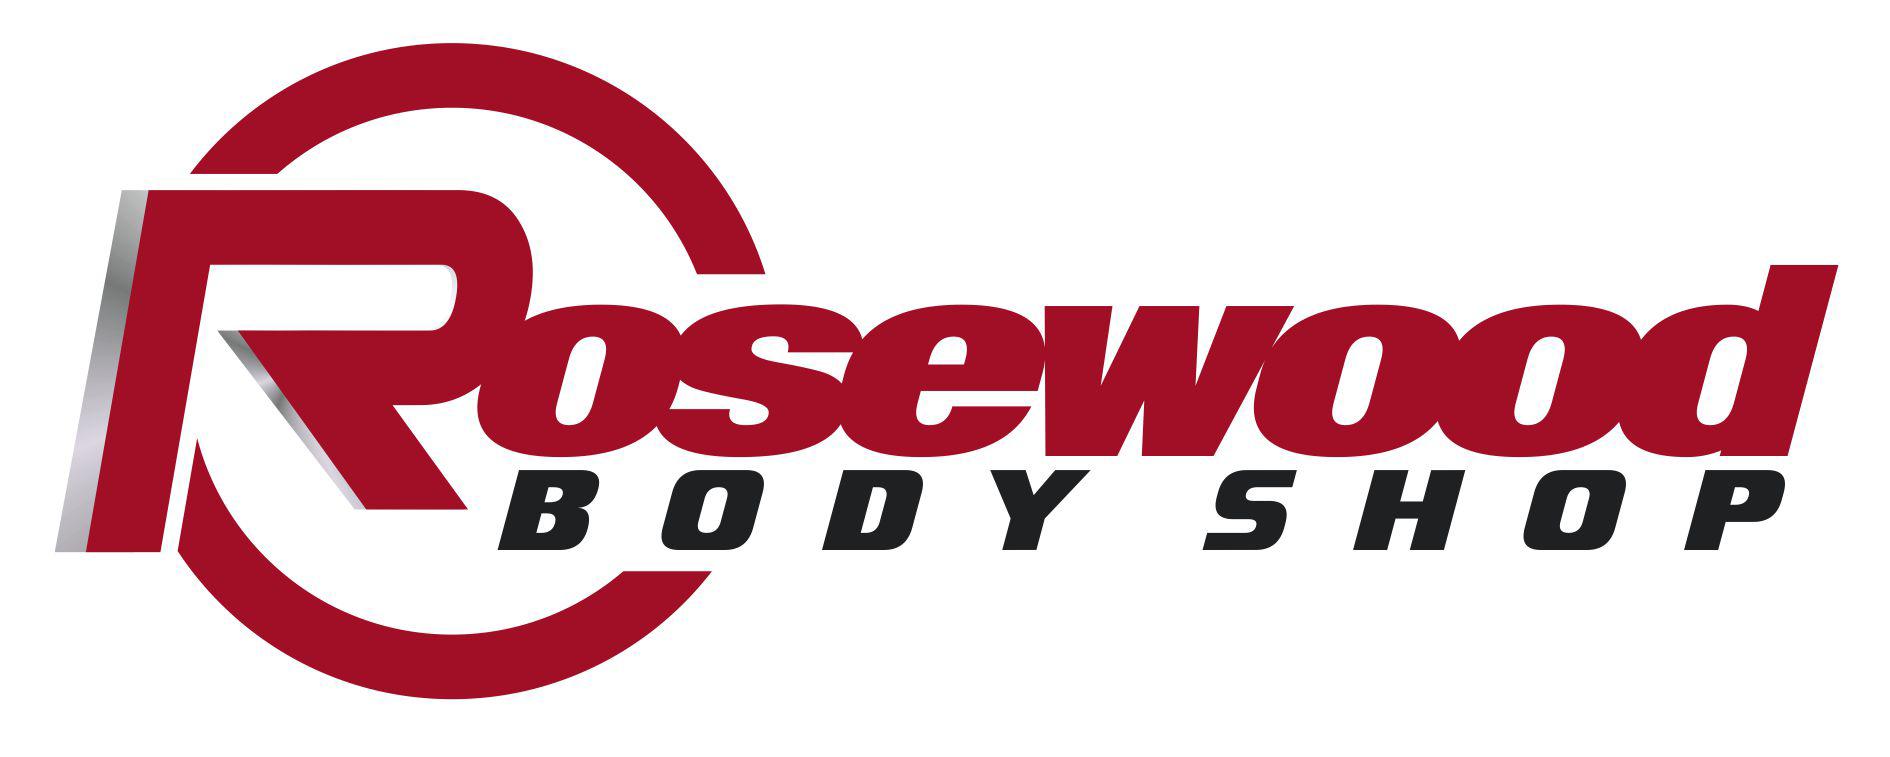 Rosewood Body Shop, Inc.